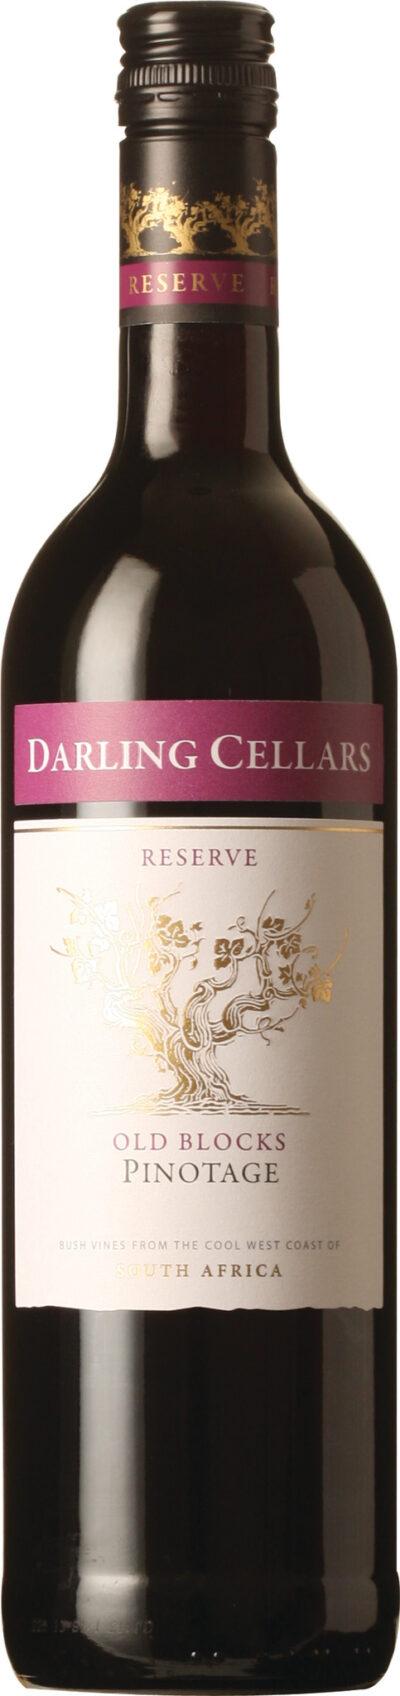 Darling Cellars Reserve Old Blocks Pinotage